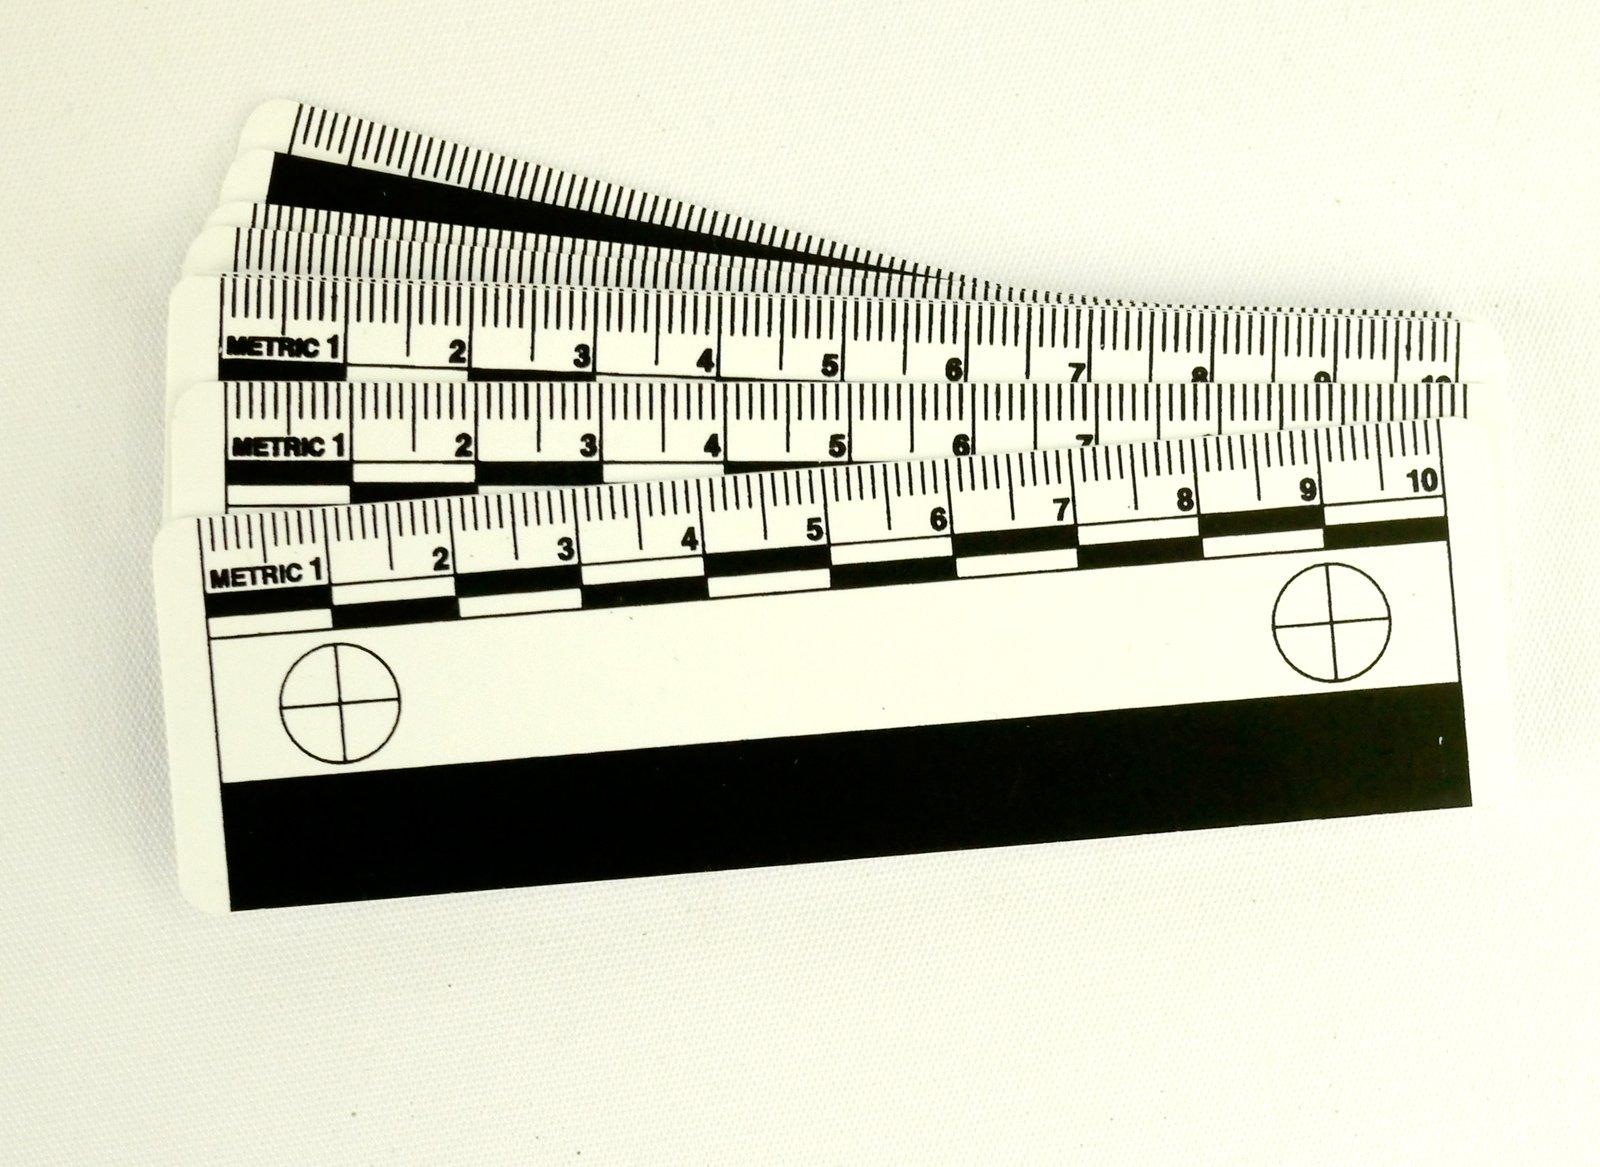 Crime Scene Photomacrographic Scale (10cm) 10pk by Crime Scene (Image #1)